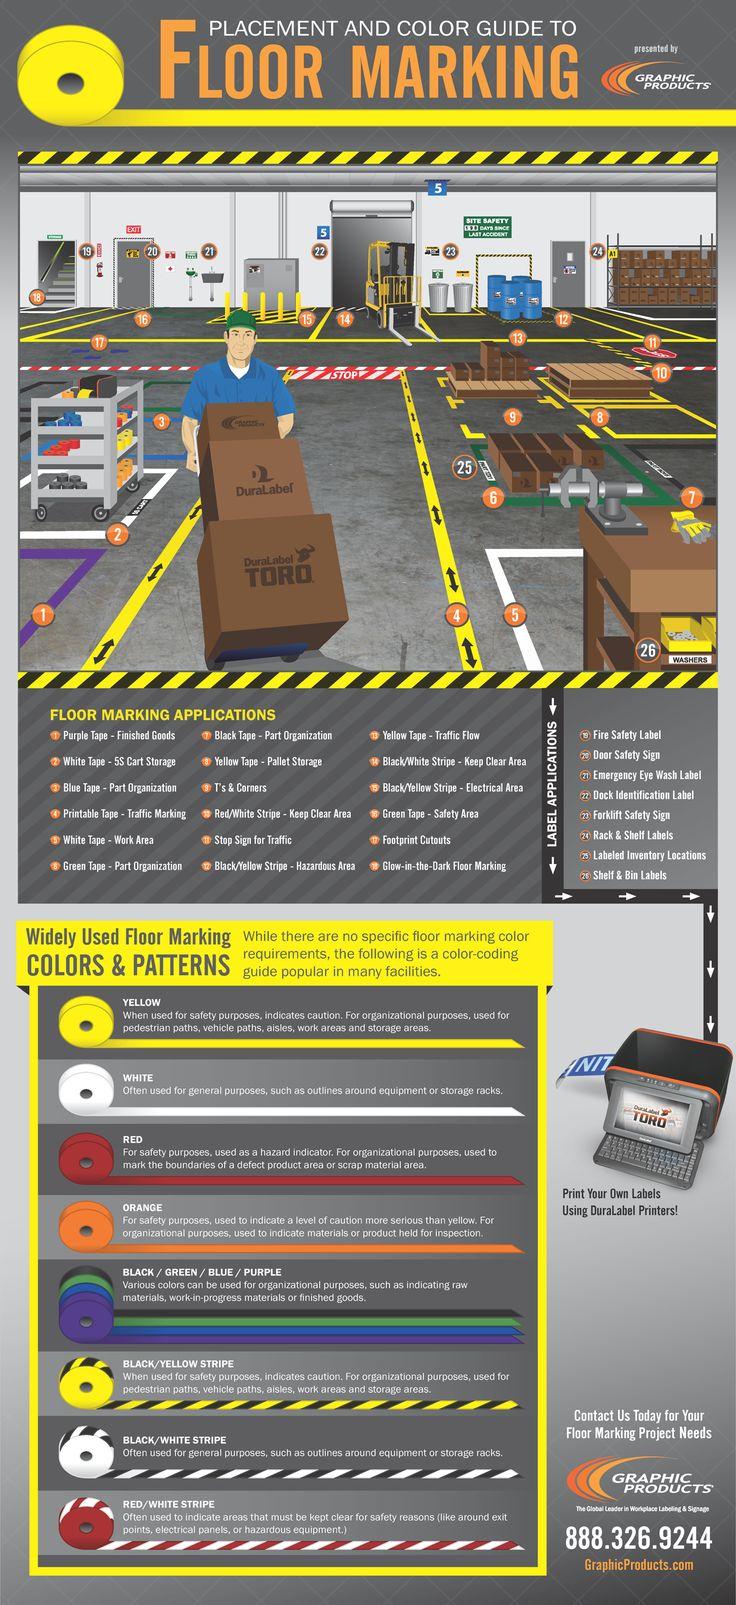 Floor Marking - Wayfinding and Visual Communication